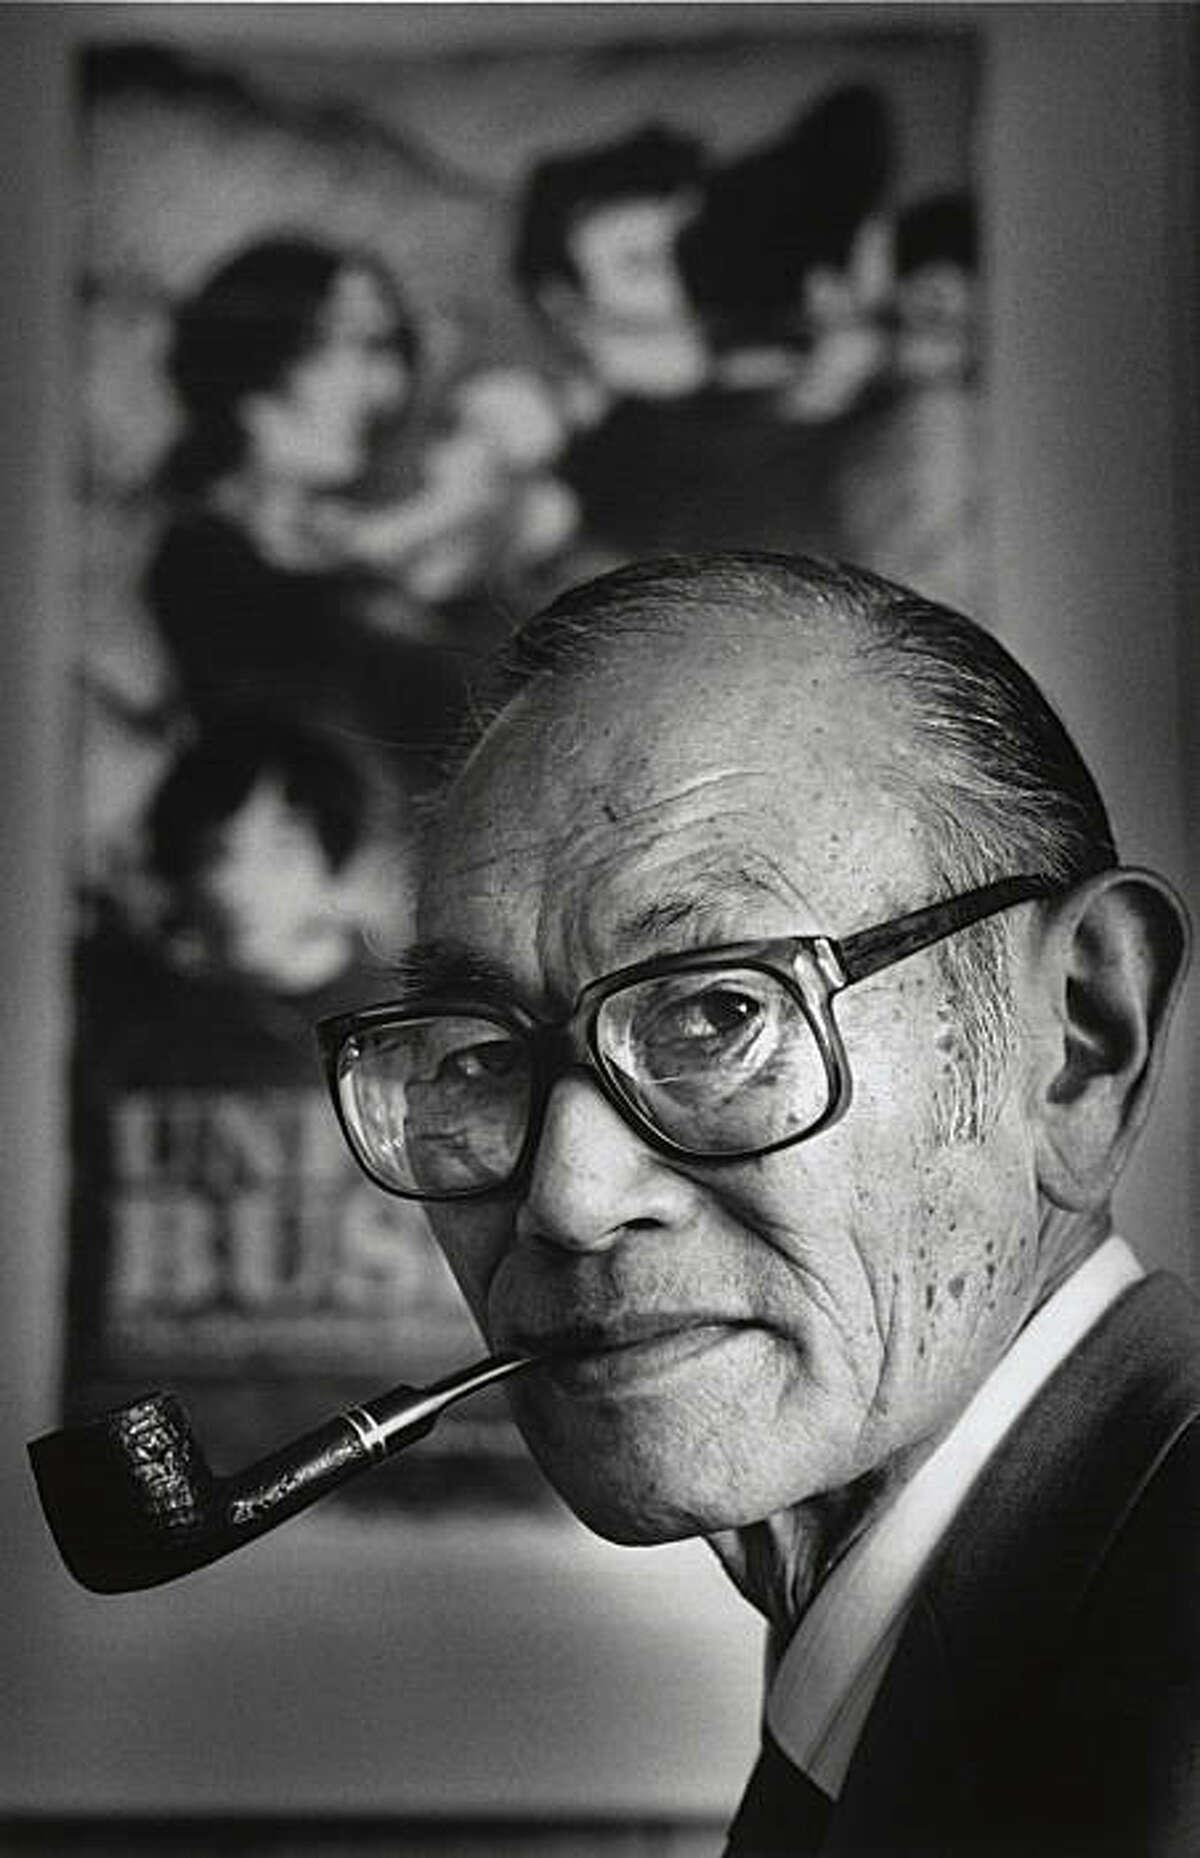 Fred Korematsu, successfuly challenged Internment camp orders during World War II. Photo was taken: 04/02/1987.